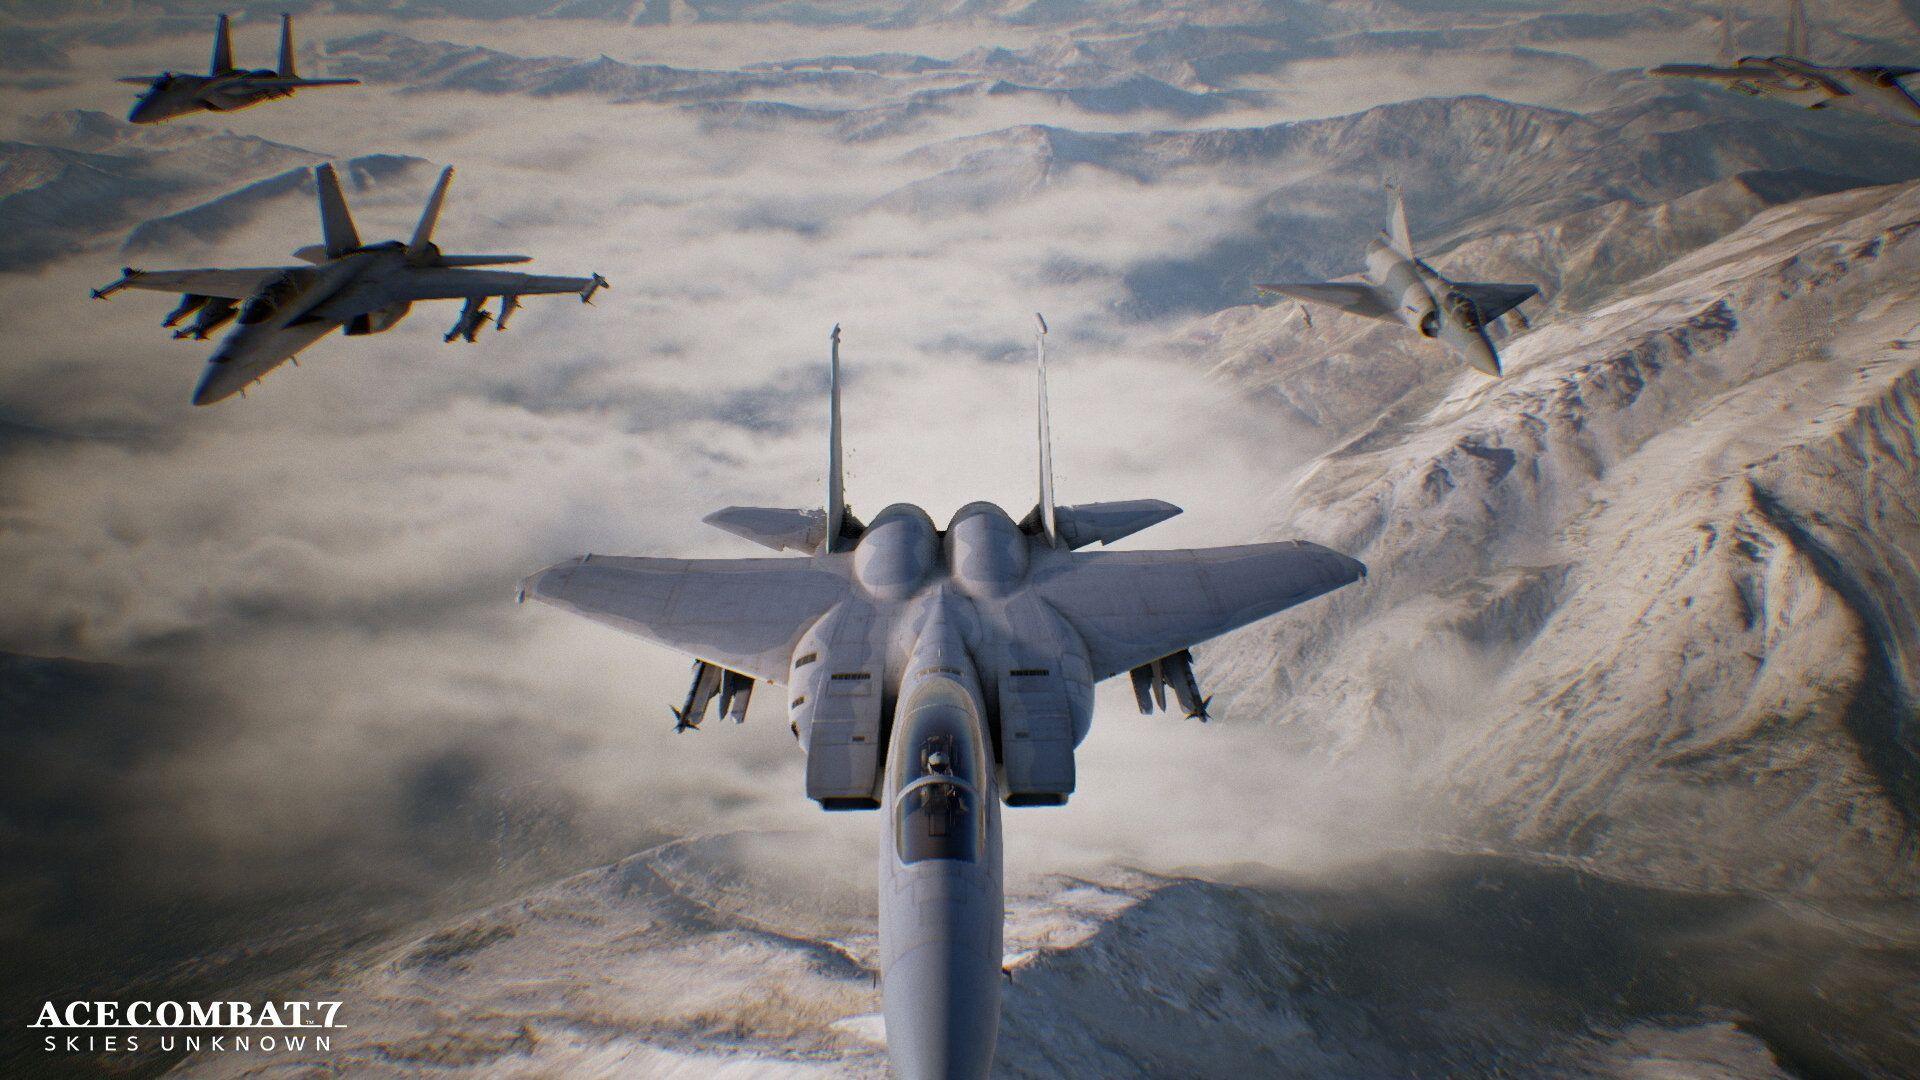 Ace Combat 7 3